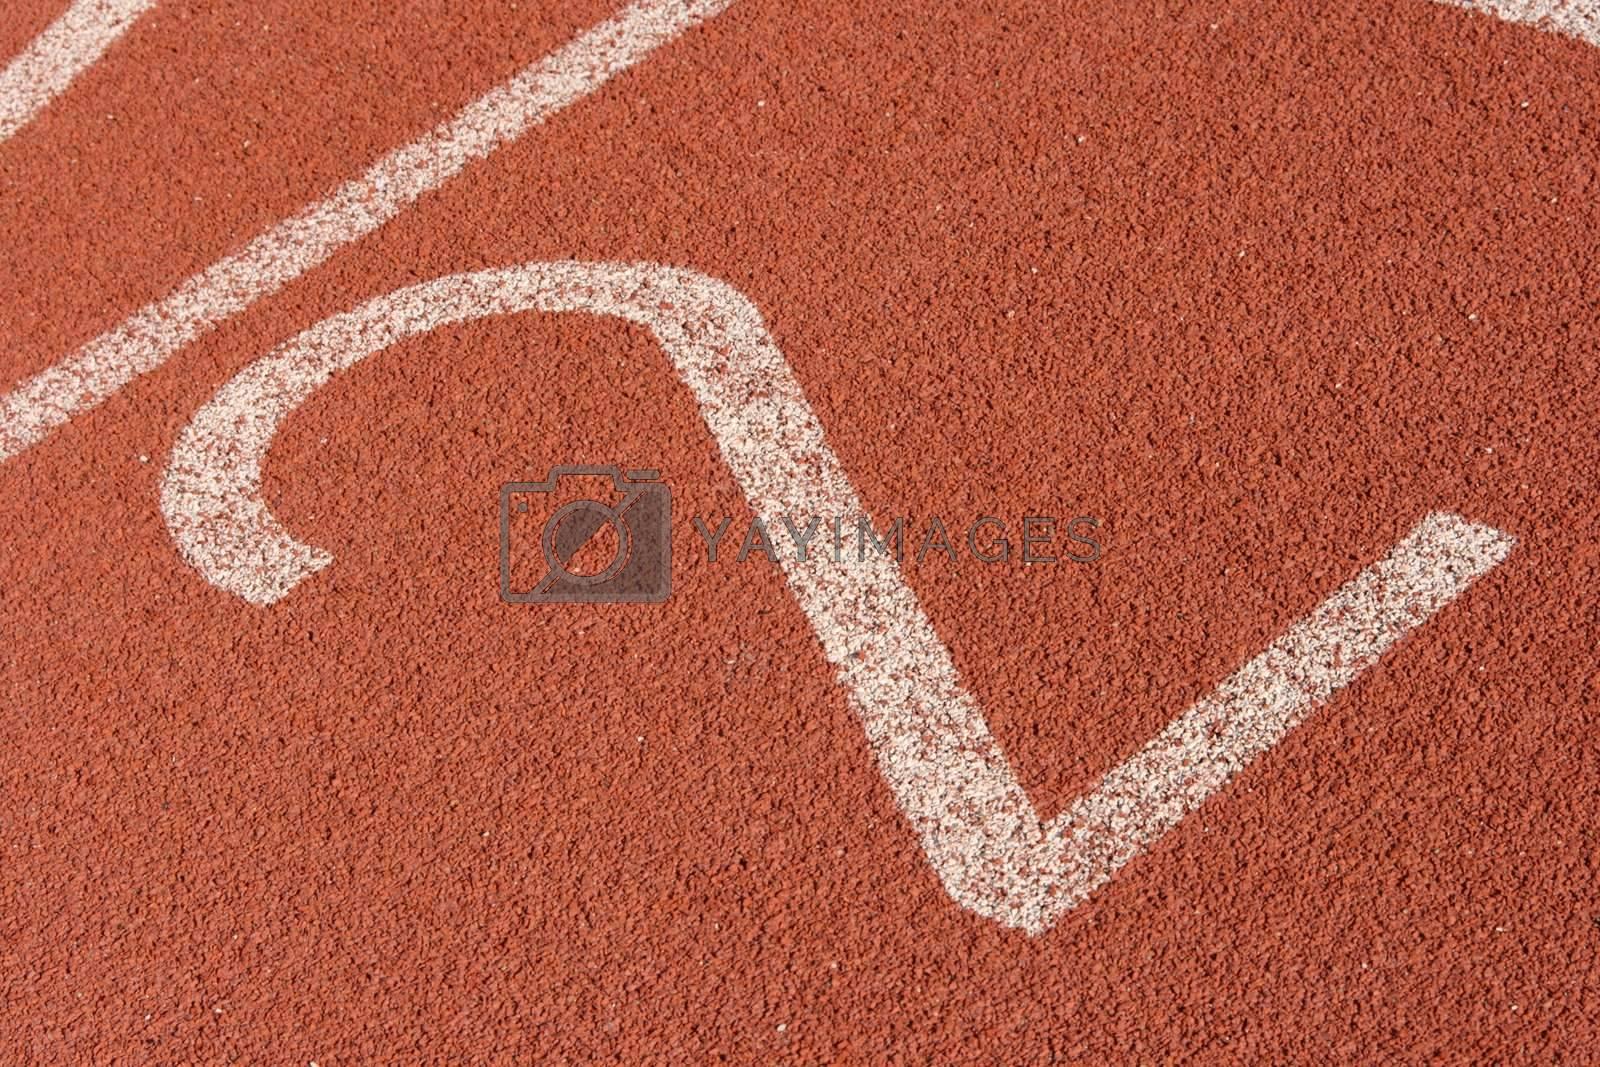 second lane race track detail sports concepts